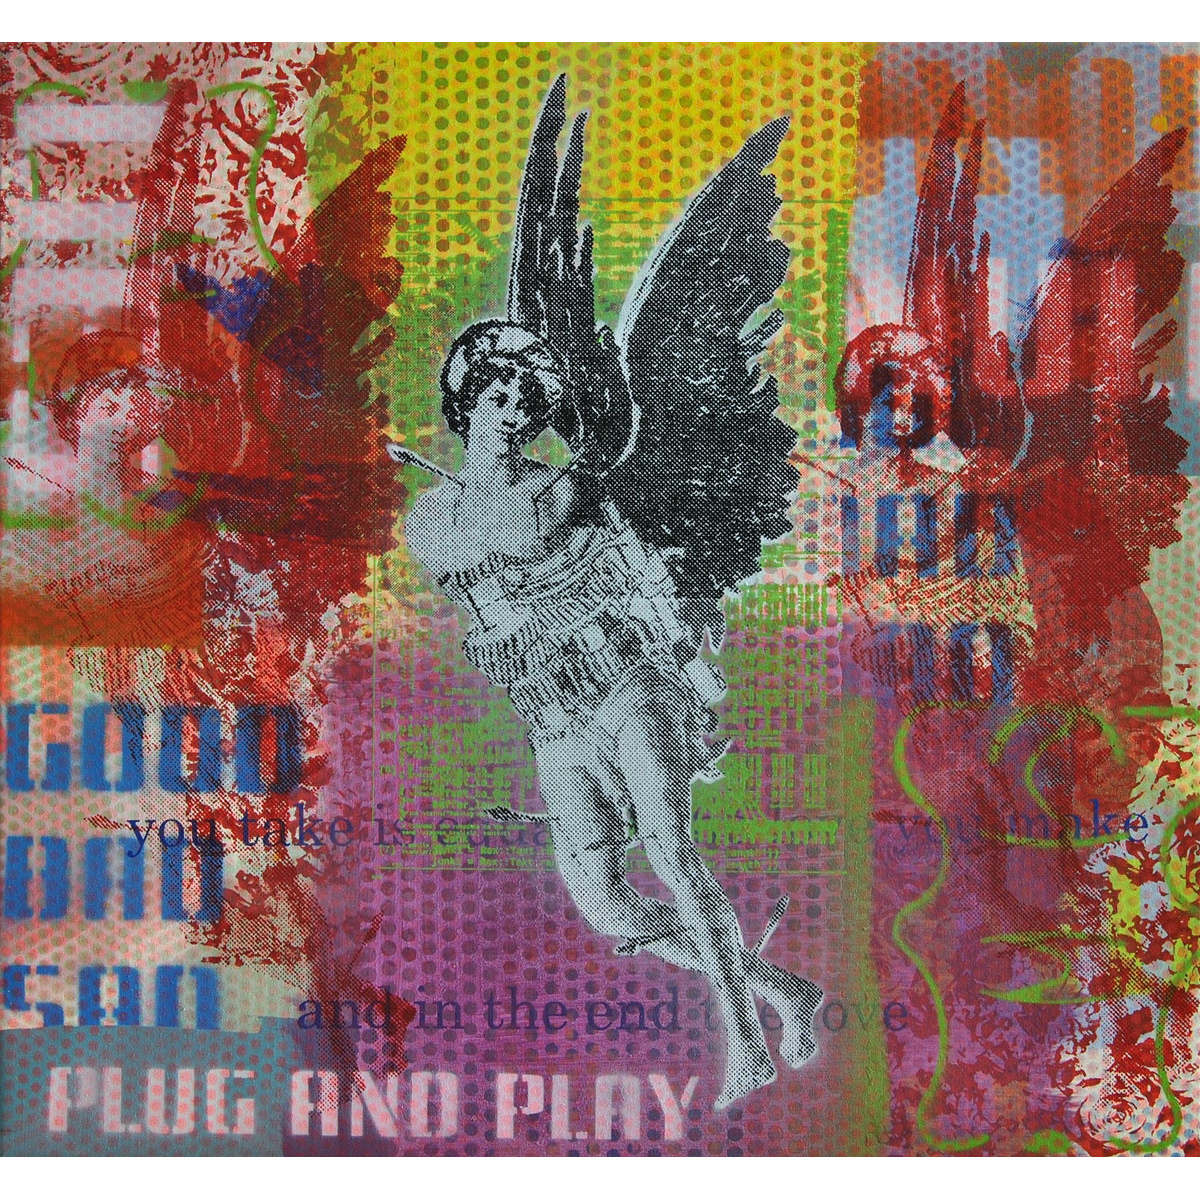 Plug and play II von Harald Klemm